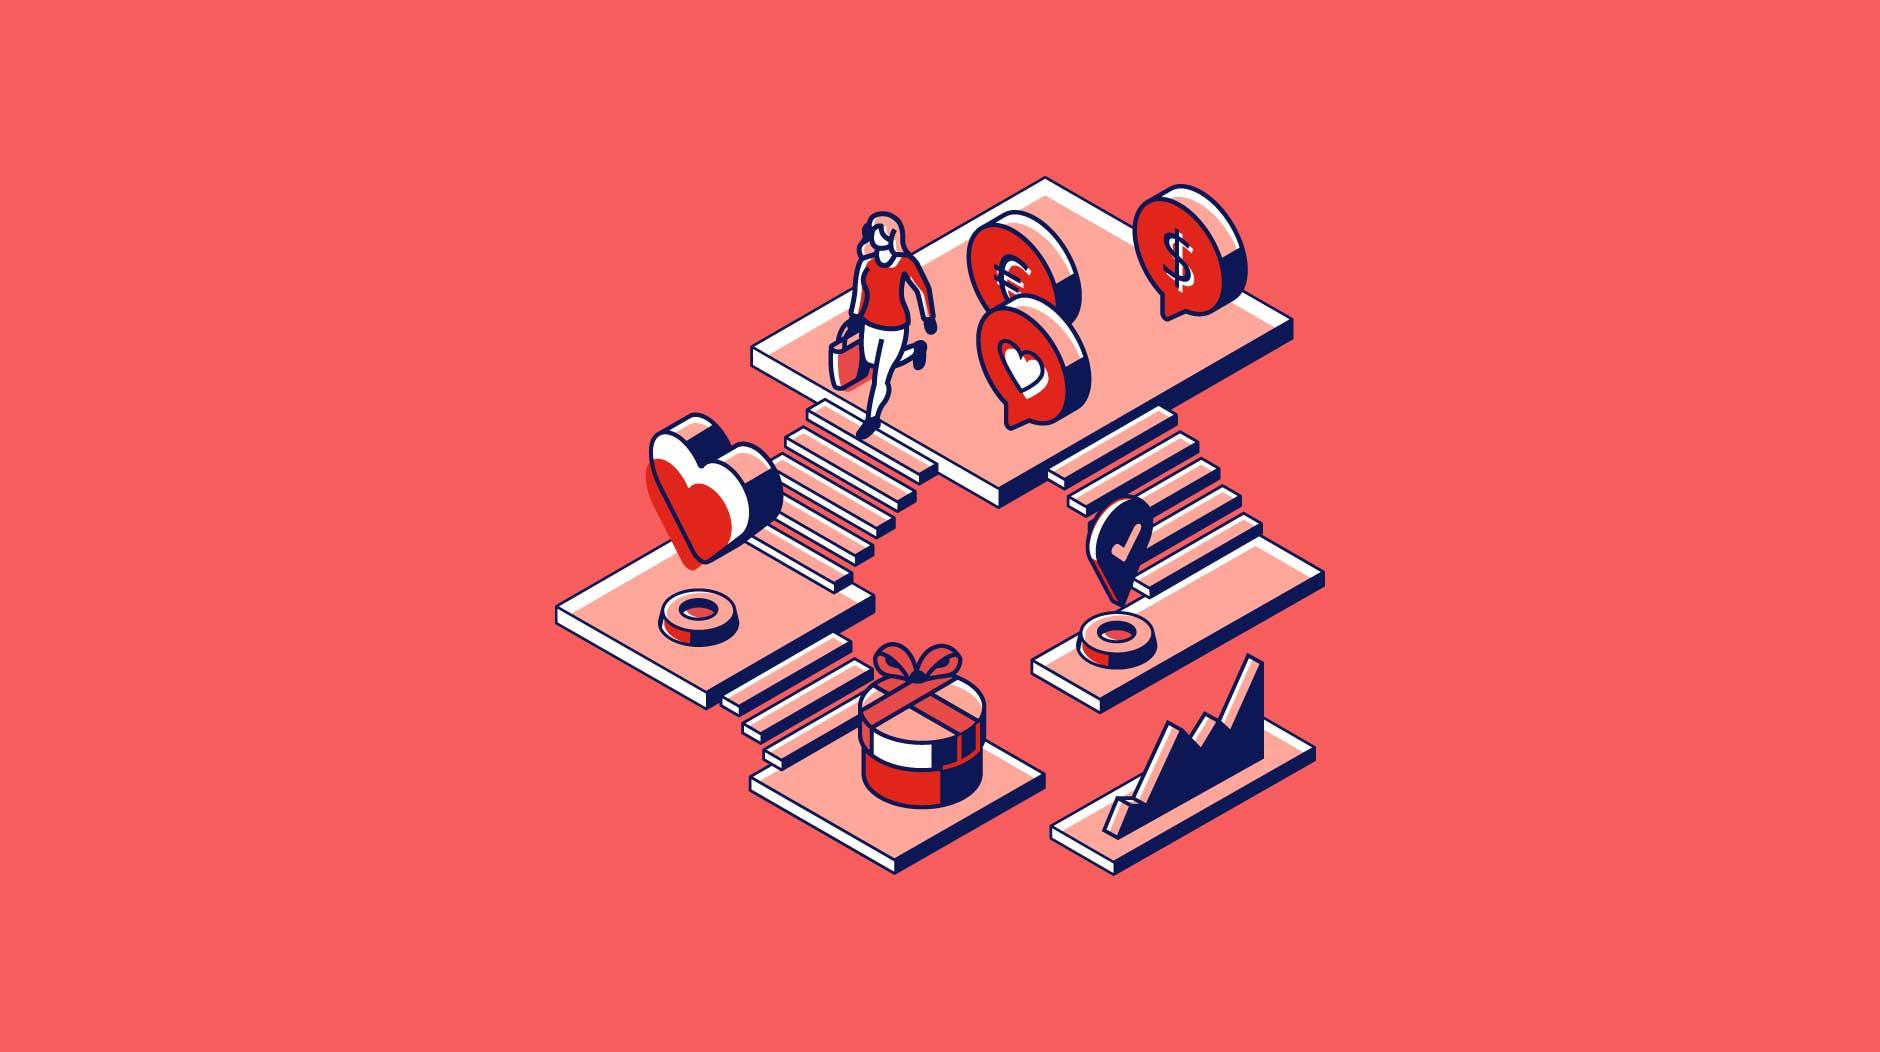 An illustration that illustrates the interconnectedness of customer journey